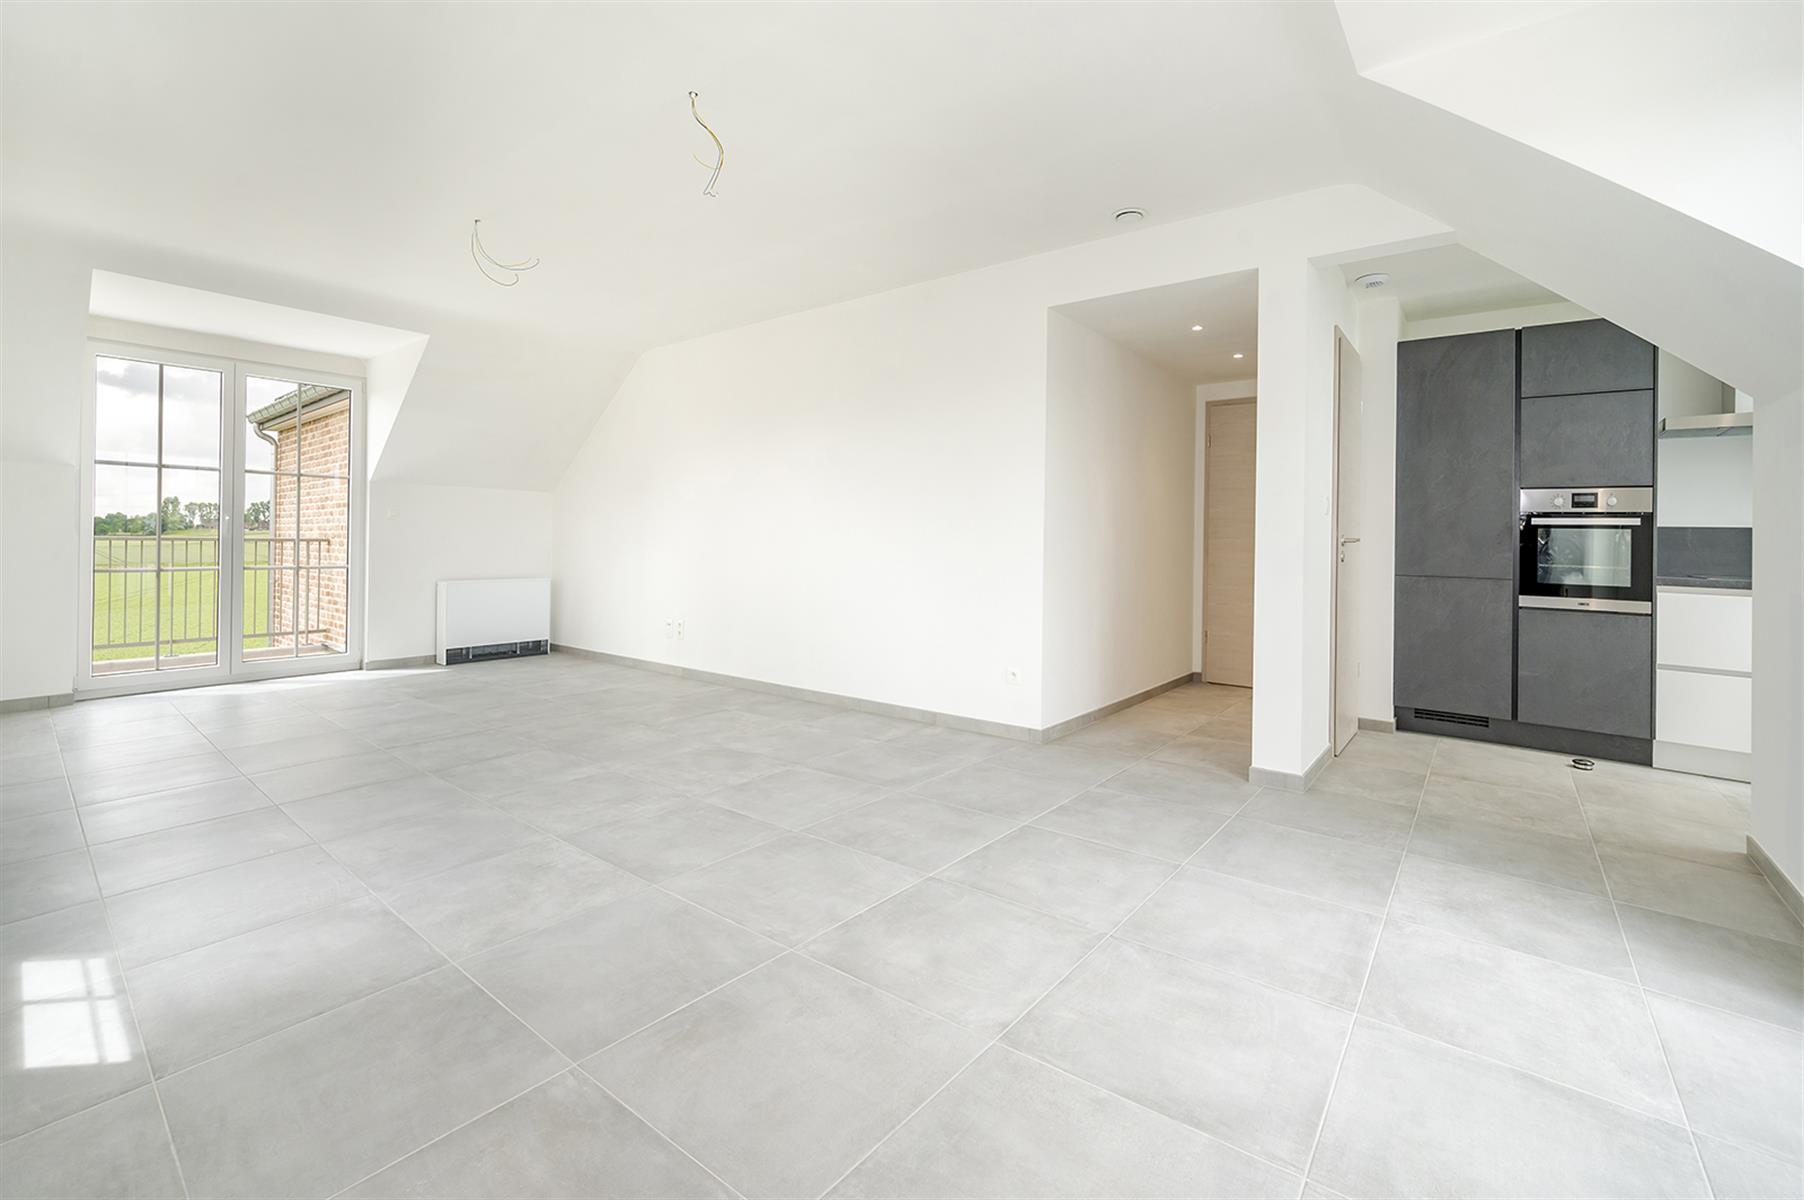 Appartement avec jardin - Huy - #3807228-7